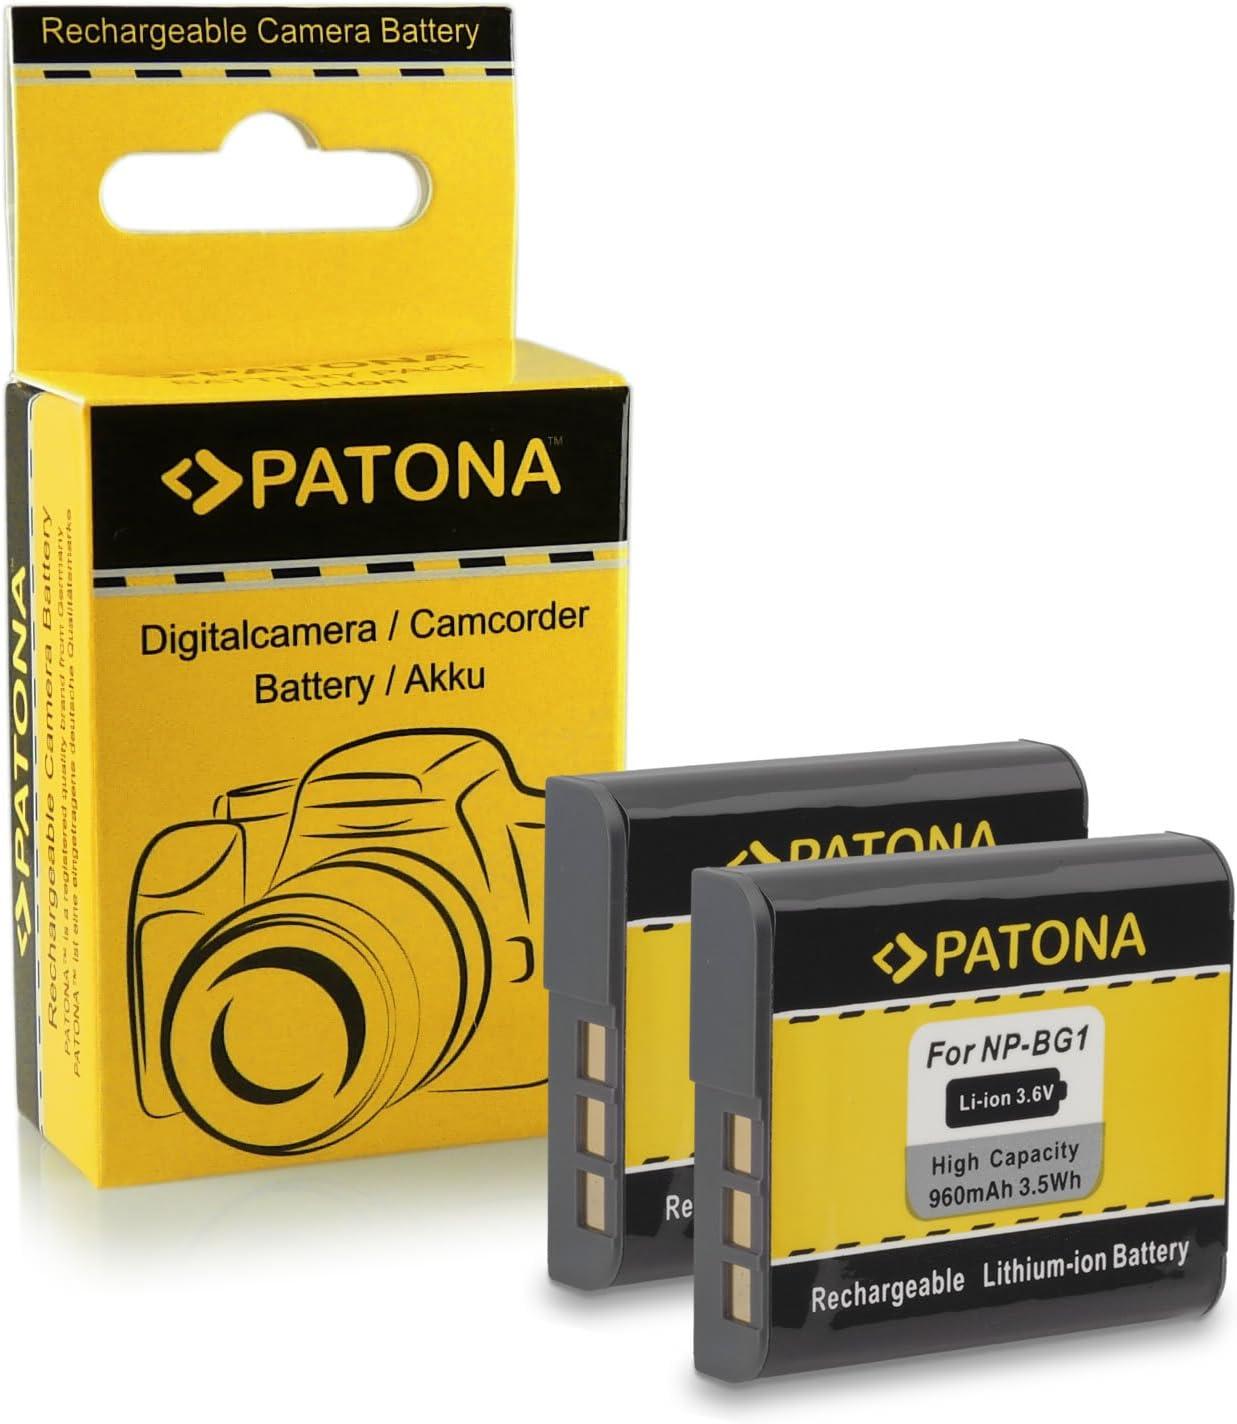 Batería CARGADOR PARA SONY dsc-h-7 dsc-h-9 dsc-h-10 bg1